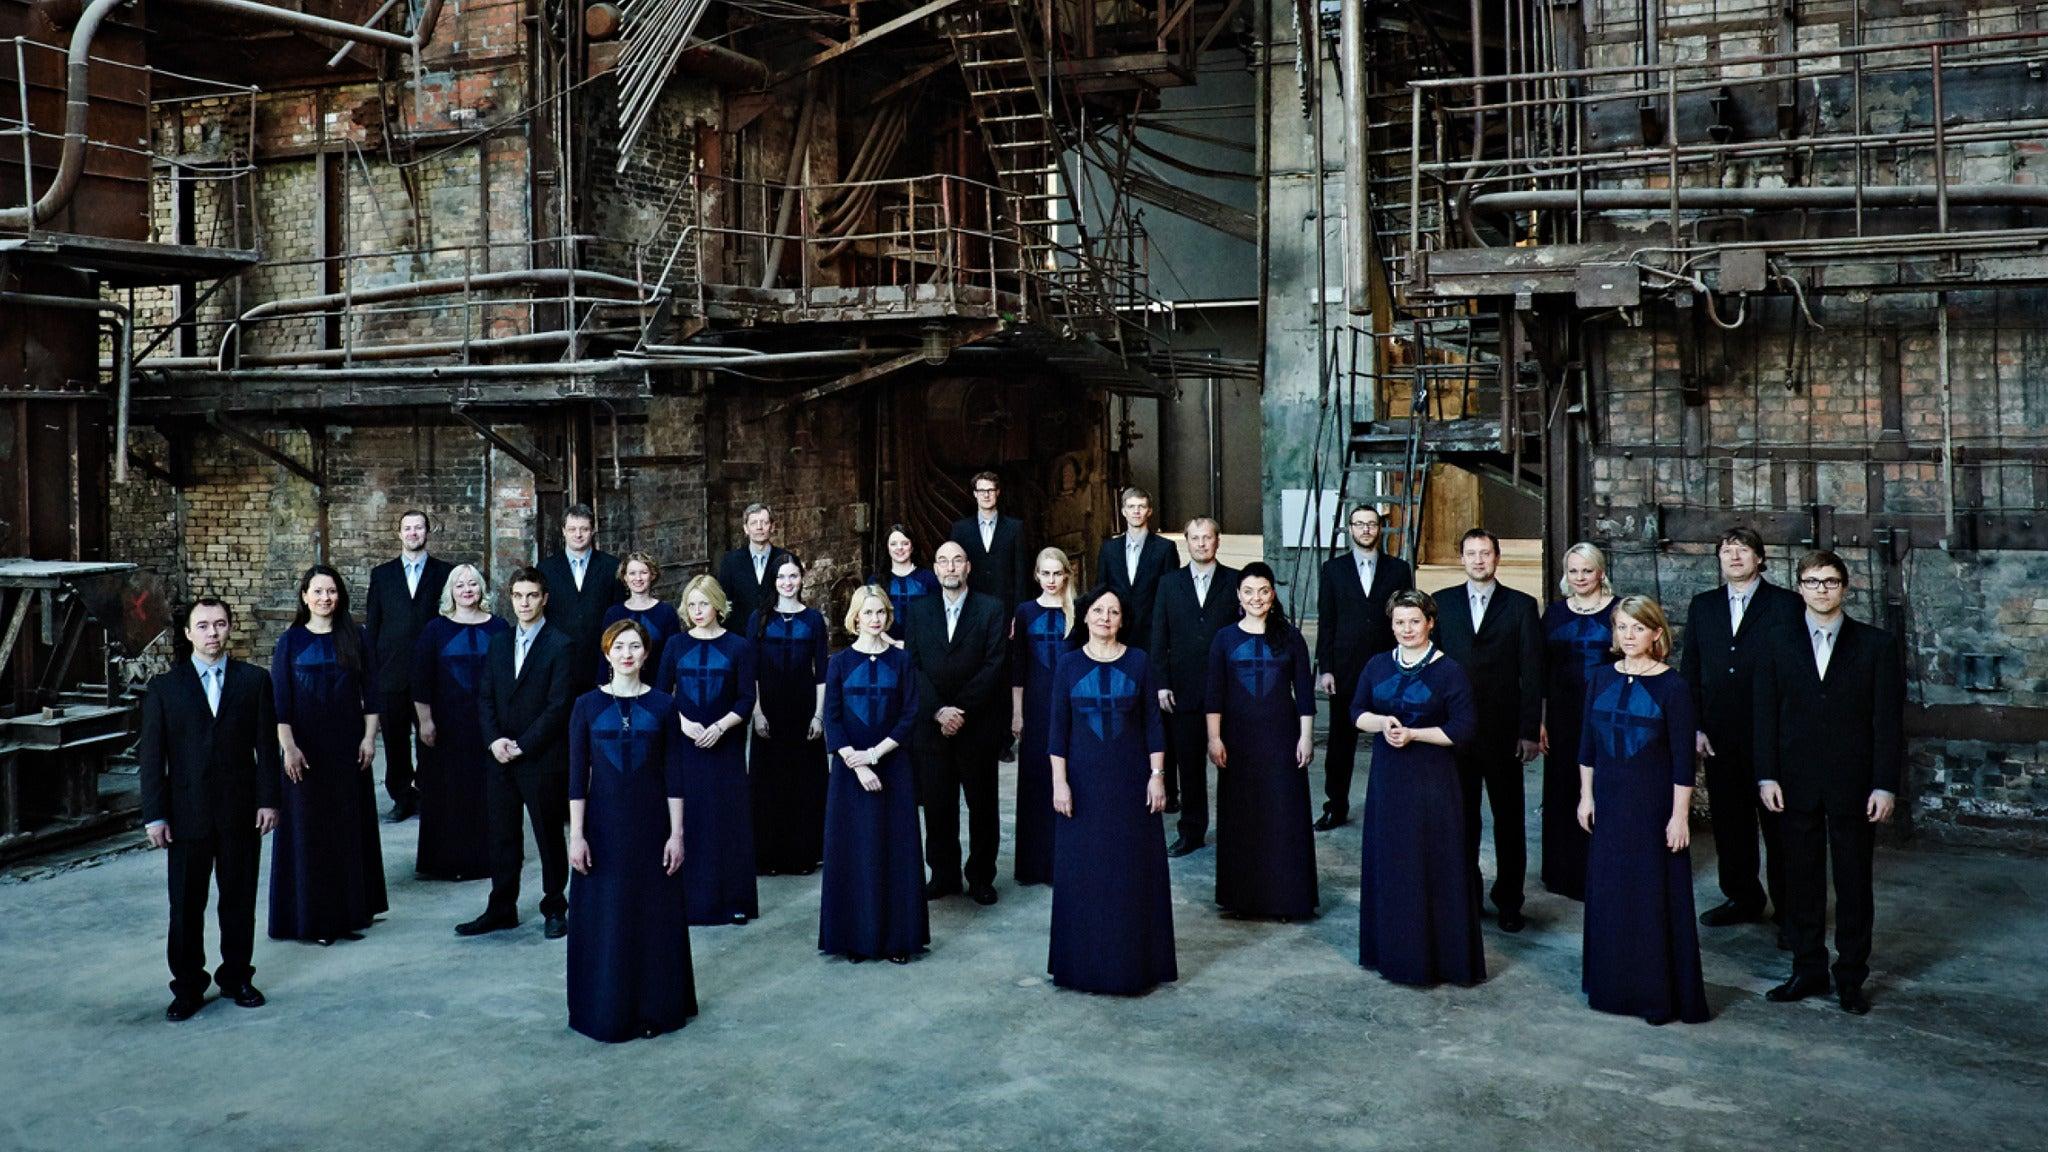 Estonian Philharmonic Chamber Choir at Royce Hall - UCLA - Los Angeles, CA 90095